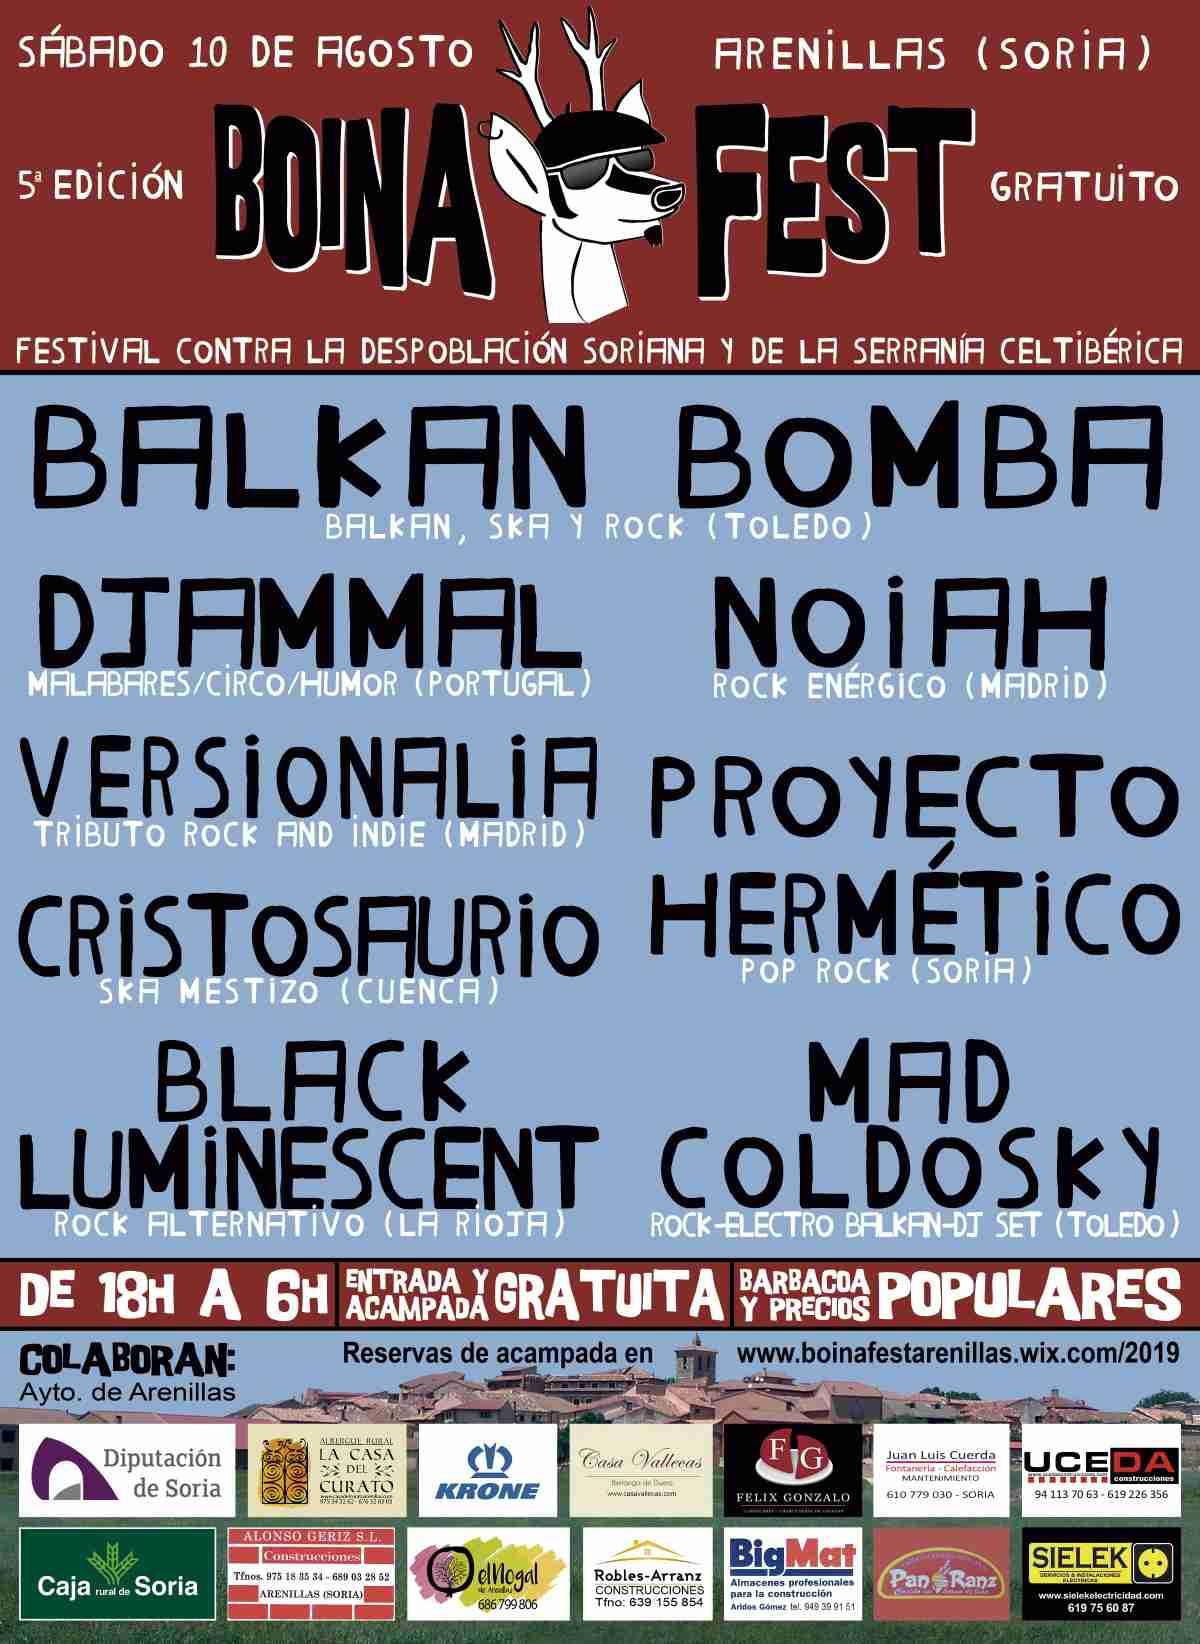 1er festival contra la despoblación Boina Fest en Arenillas Soria este 10 de agosto 1